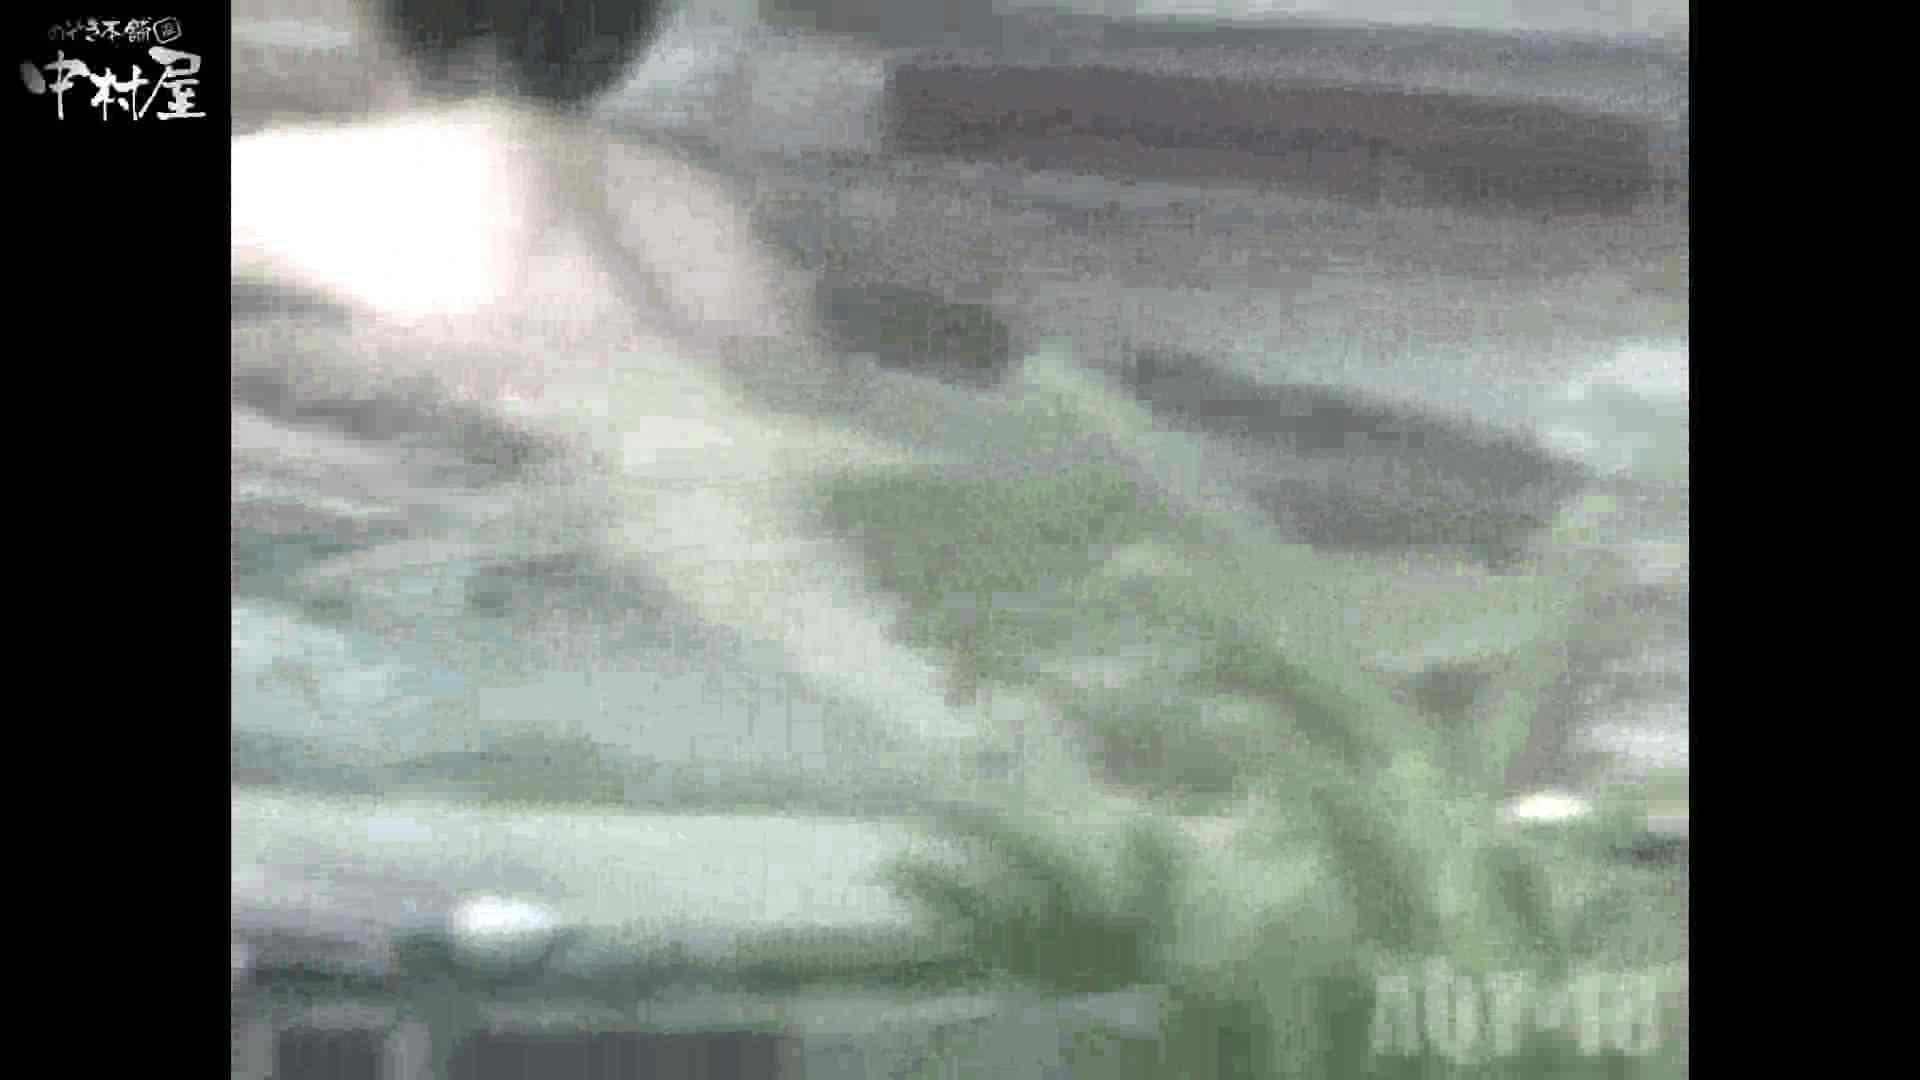 Aquaな露天風呂Vol.882潜入盗撮露天風呂十八判湯 其の二 OLエロ画像 覗きスケベ動画紹介 78PICs 38